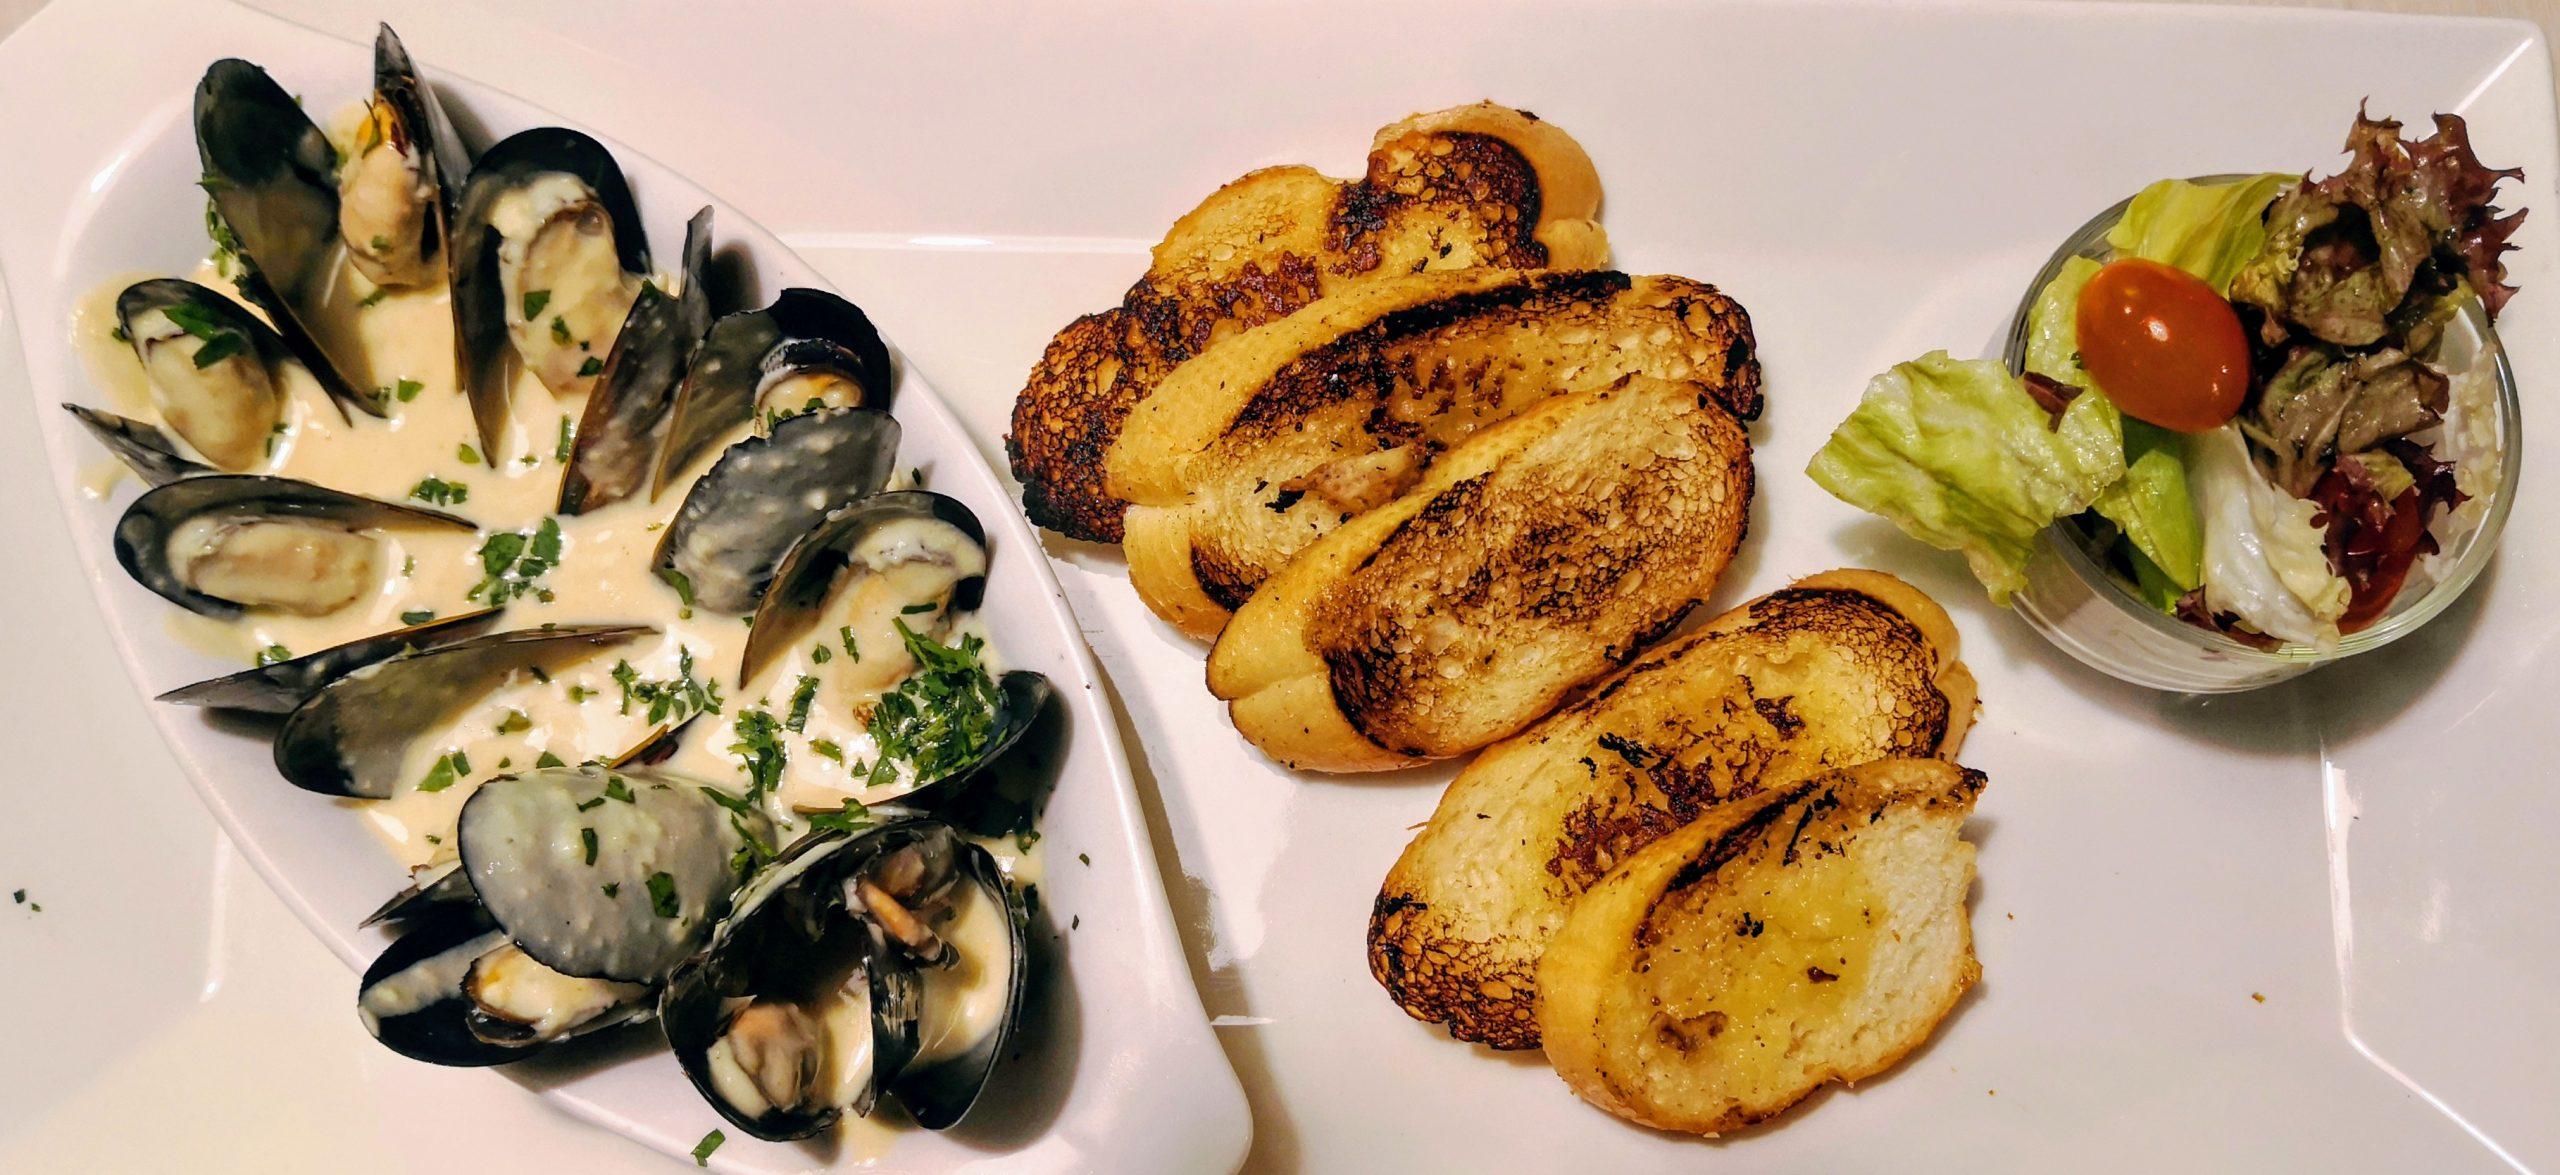 Manhattan Fish Market Amman- Mussels